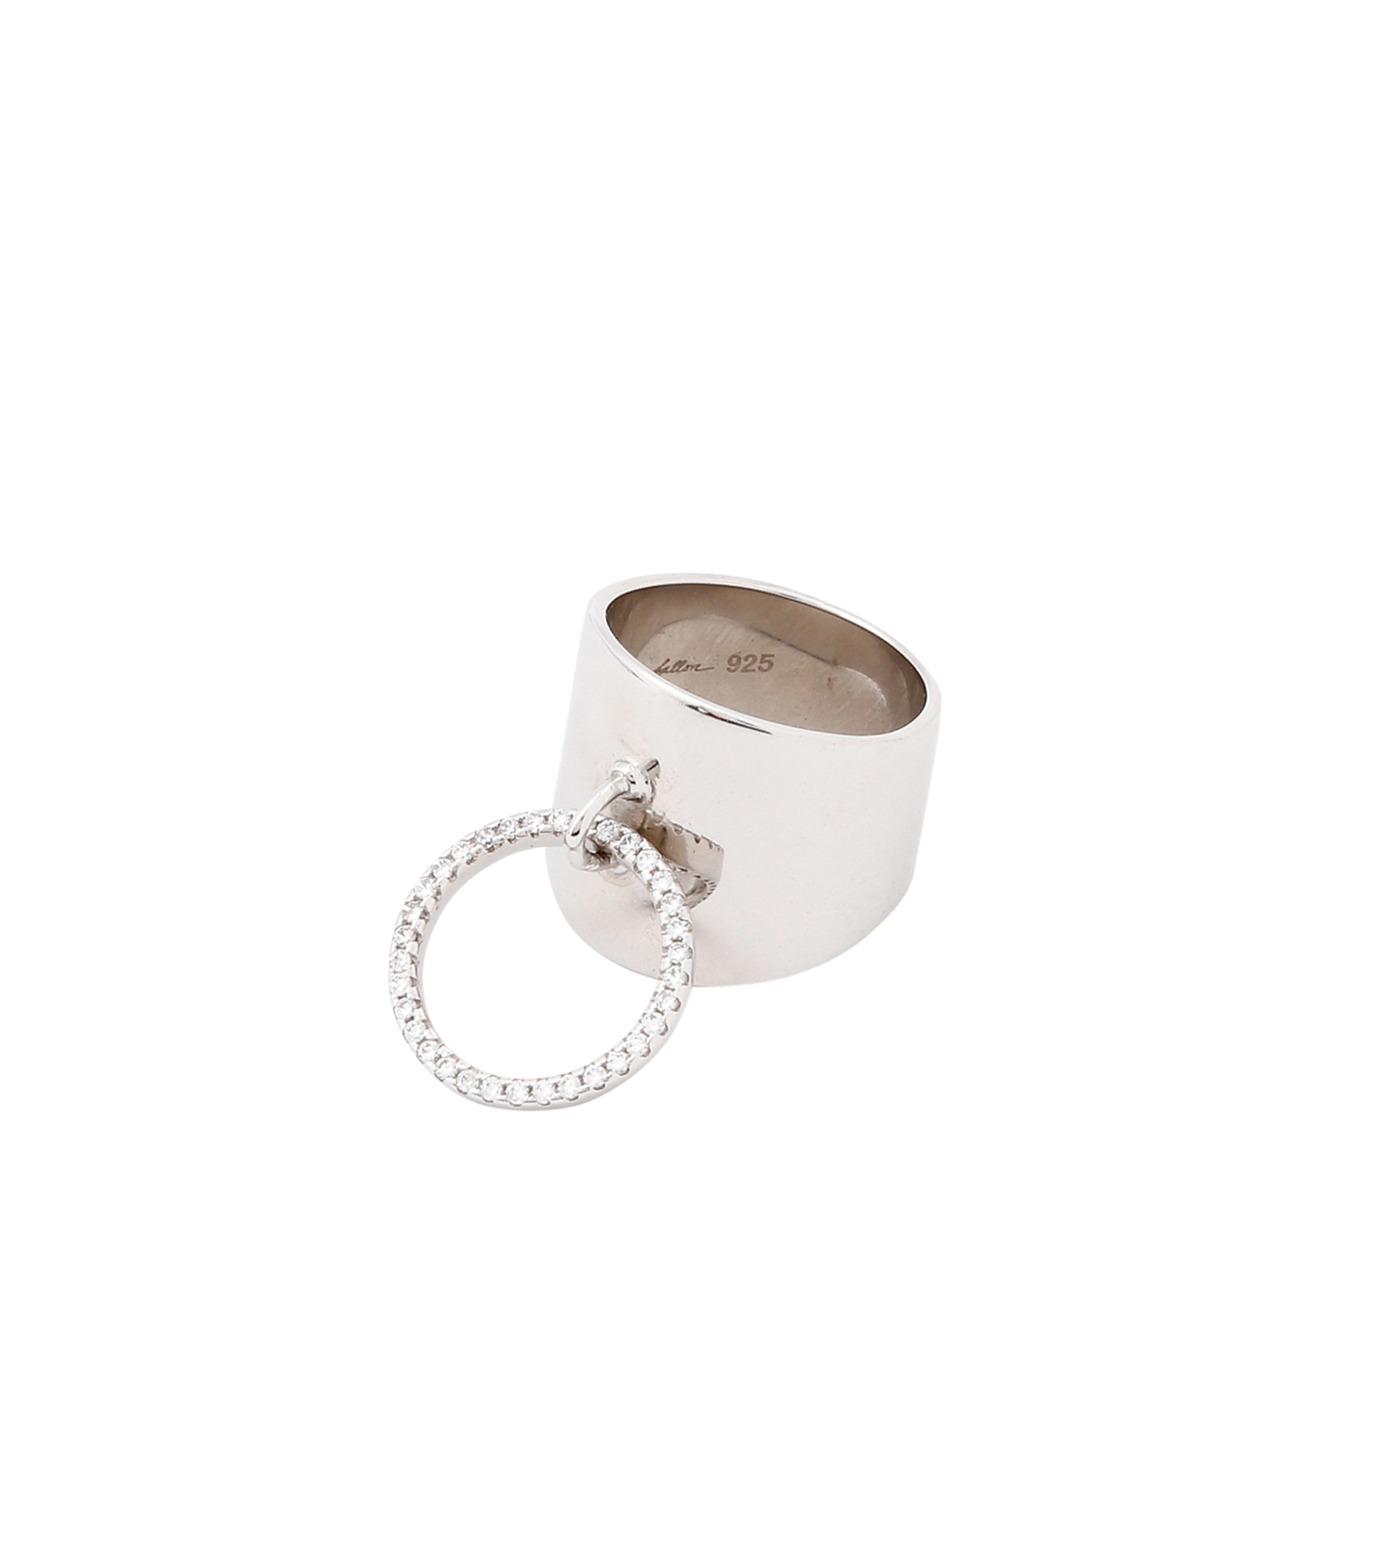 Fallon(ファロン)のArmure Pave Knocker Barrel Ring-SILVER(リング/ring)-FR21609-1 拡大詳細画像3